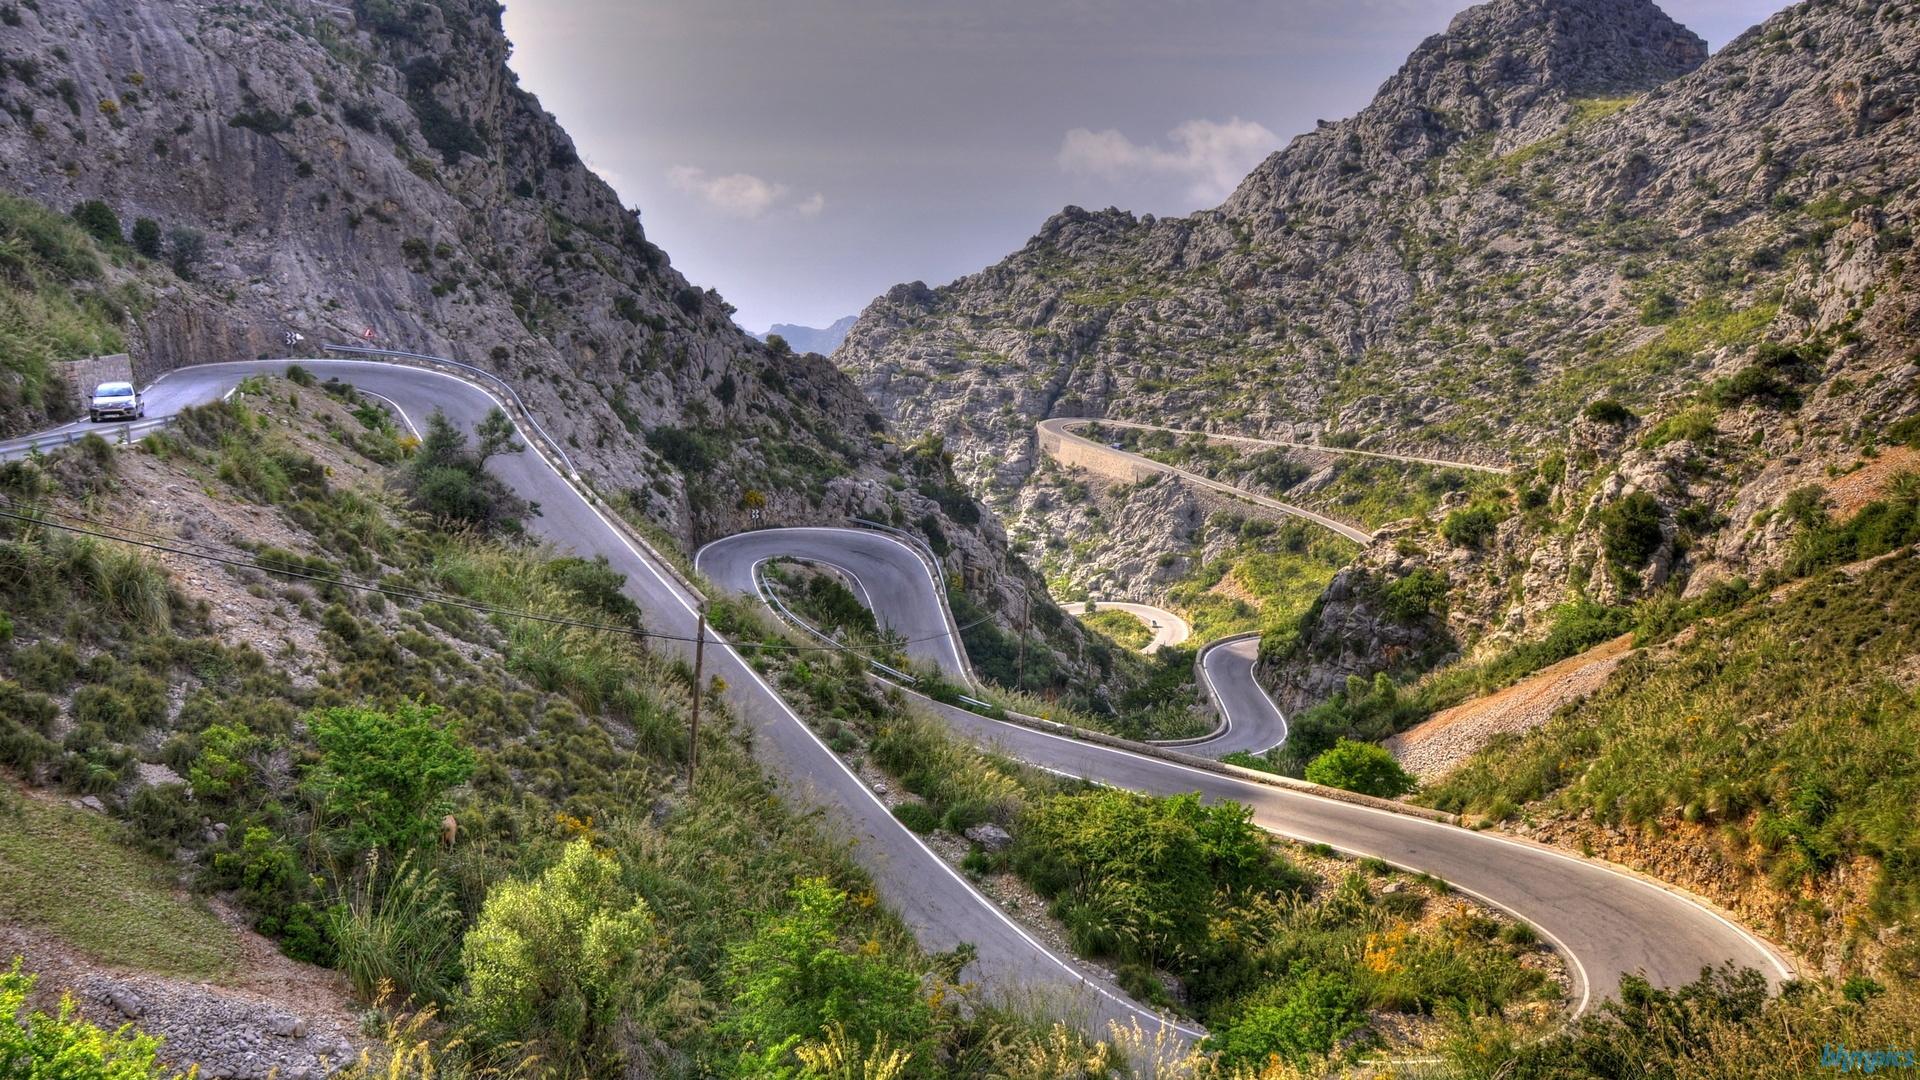 Fantastic Calobra Mountain Road In Spain Hdr Wallpaper #63994 - Resolution 1920x1080 px